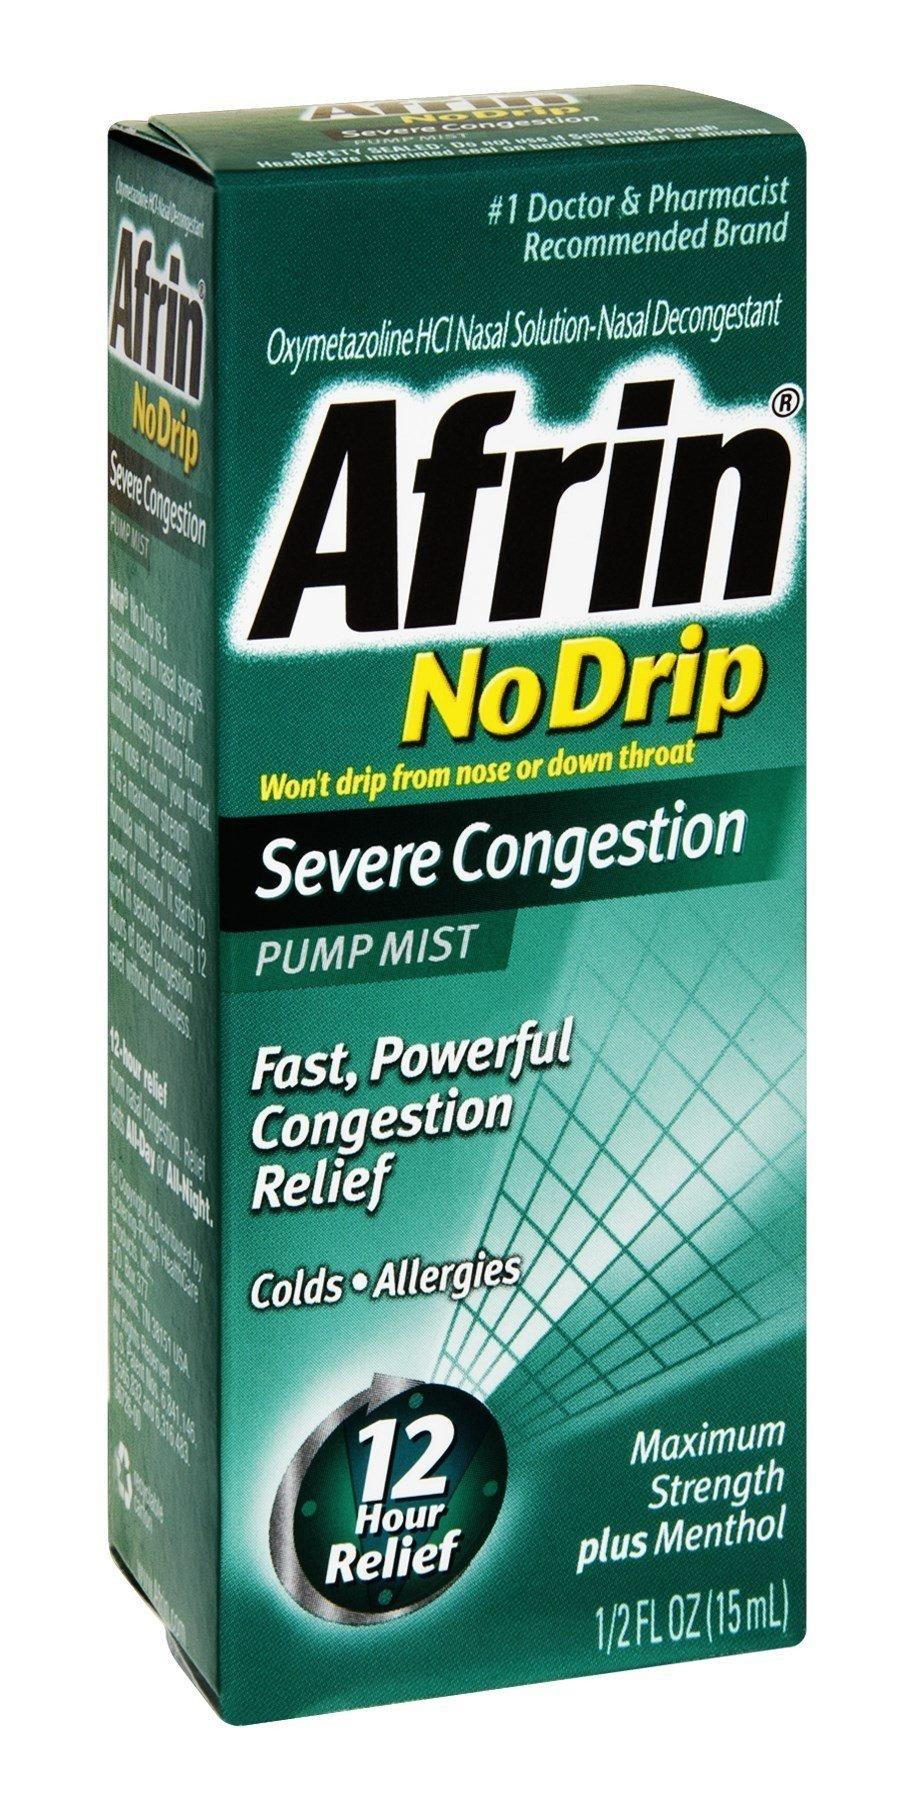 Afrin 12 Hour No Drip Severe Pump Mist, Pack of 18